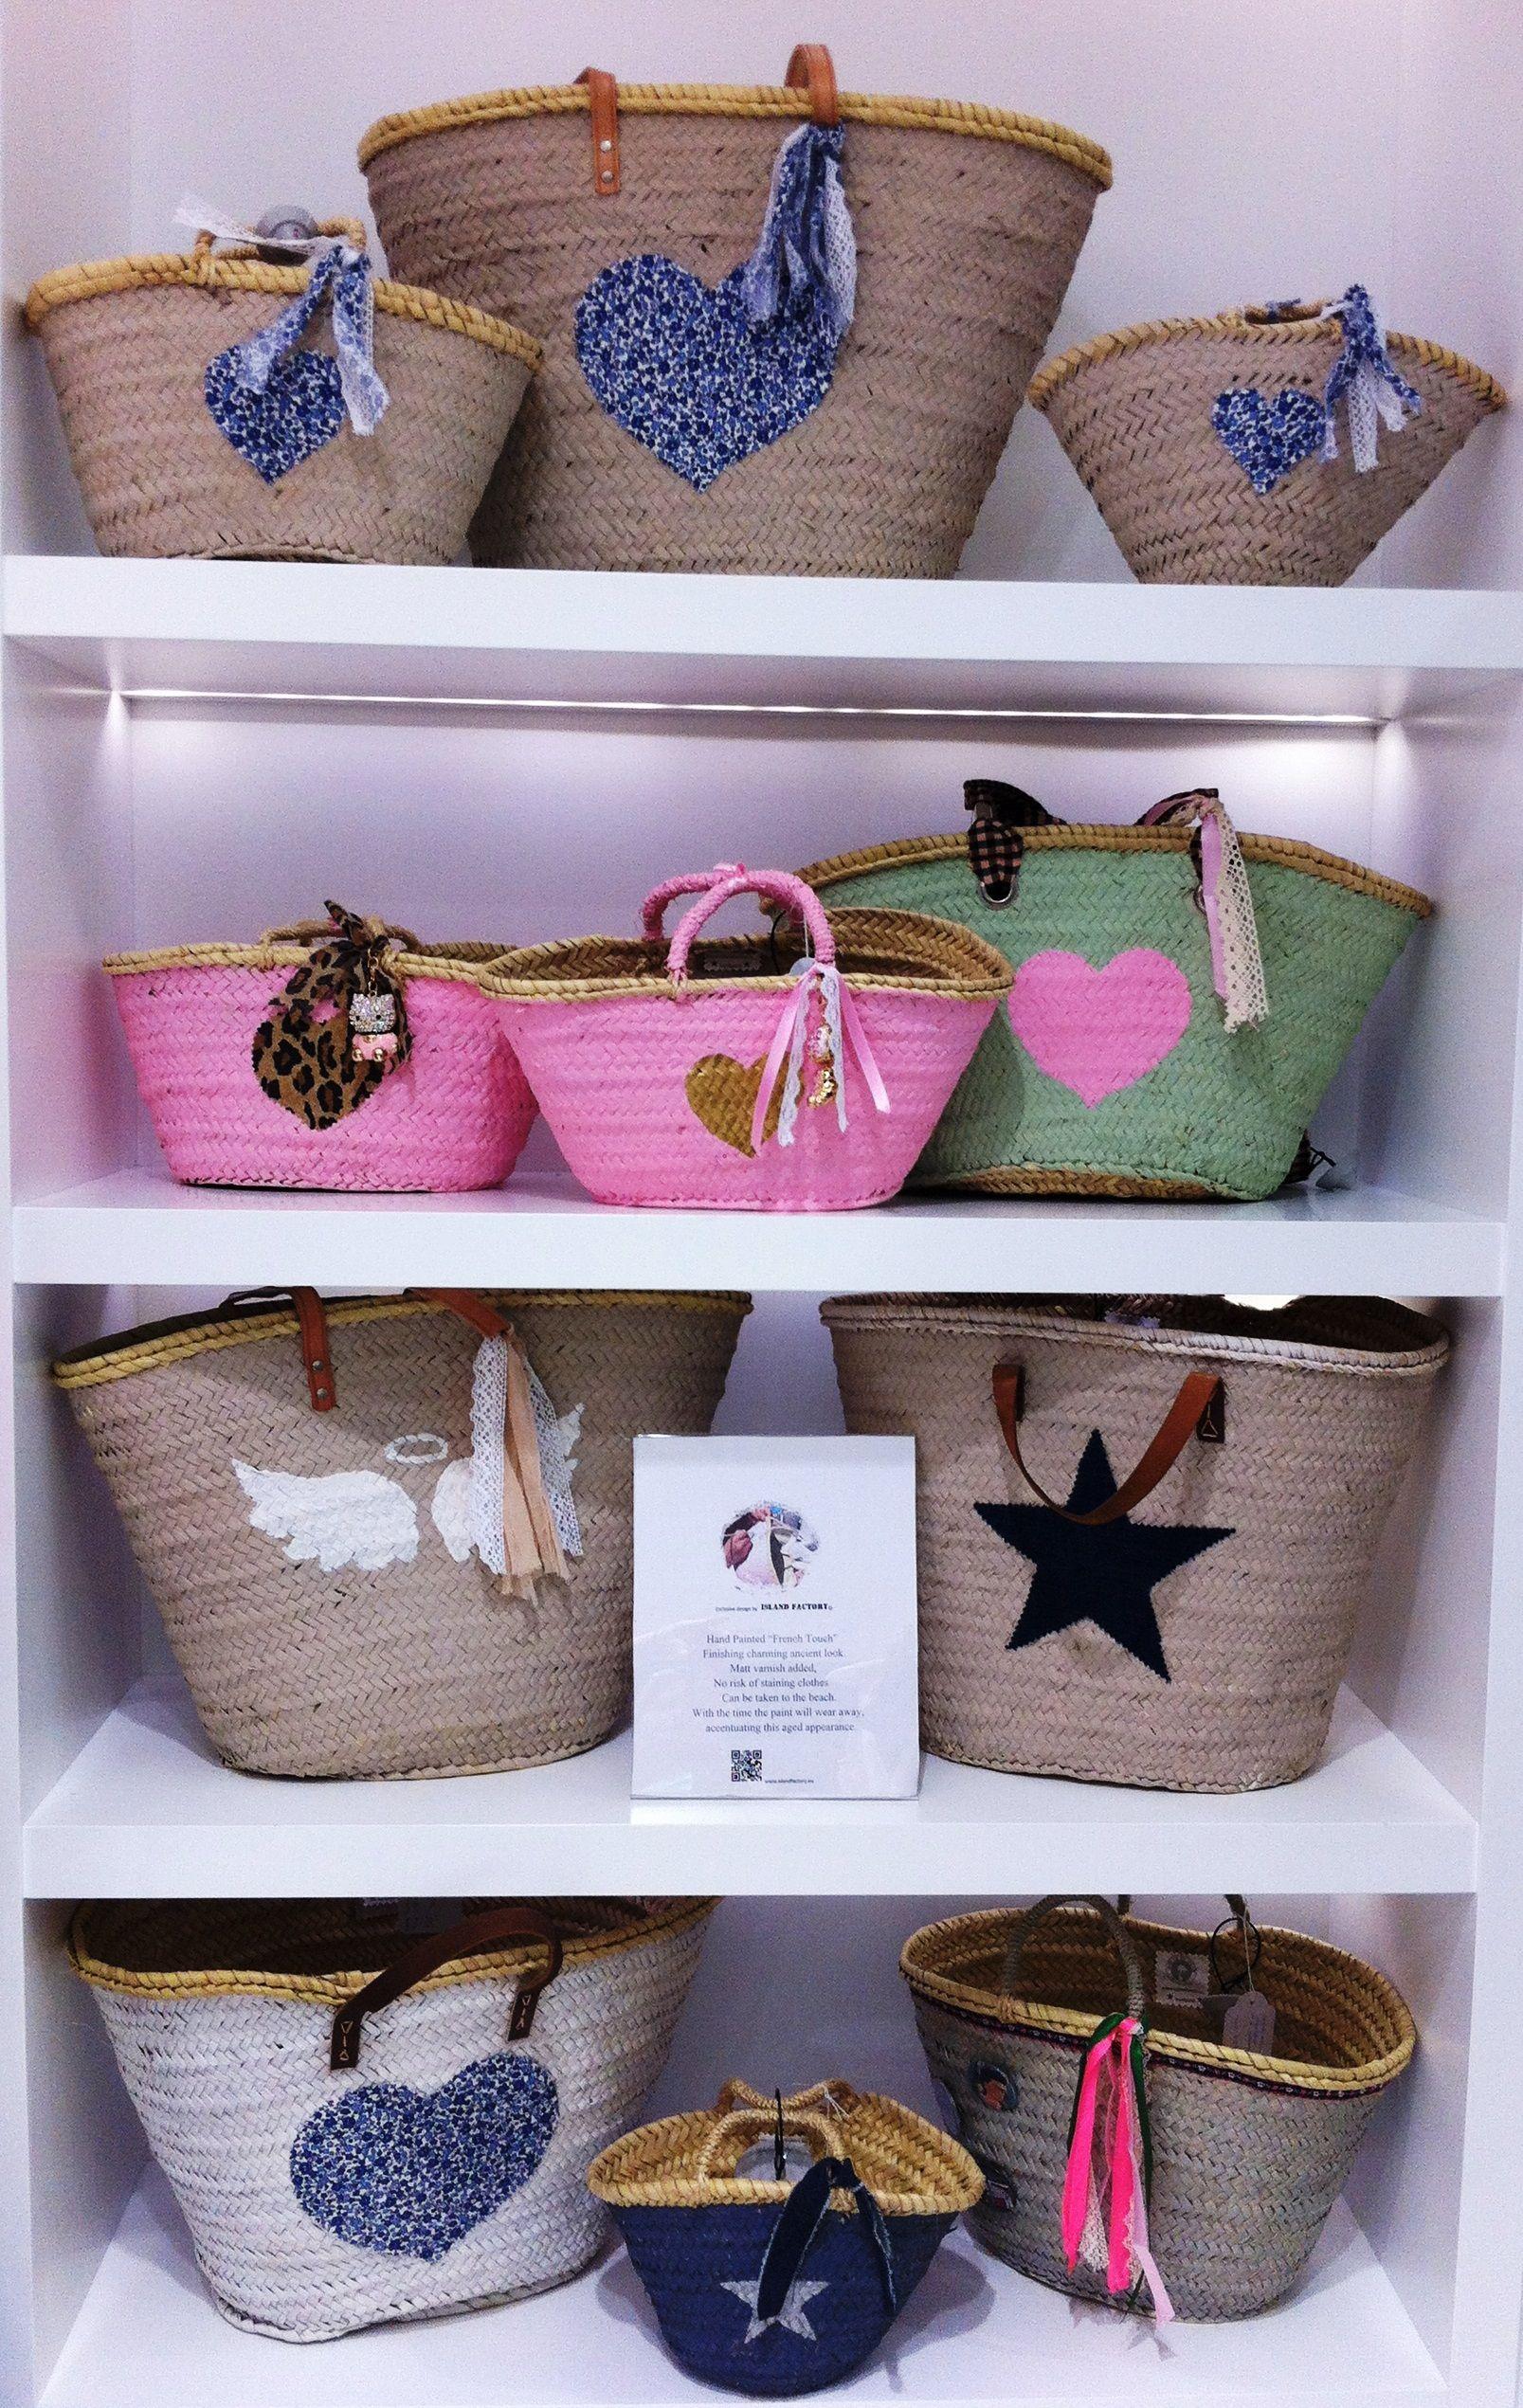 Beach bag cesta playa panier plage wholesale islandfactory - Cestas de playa personalizadas ...